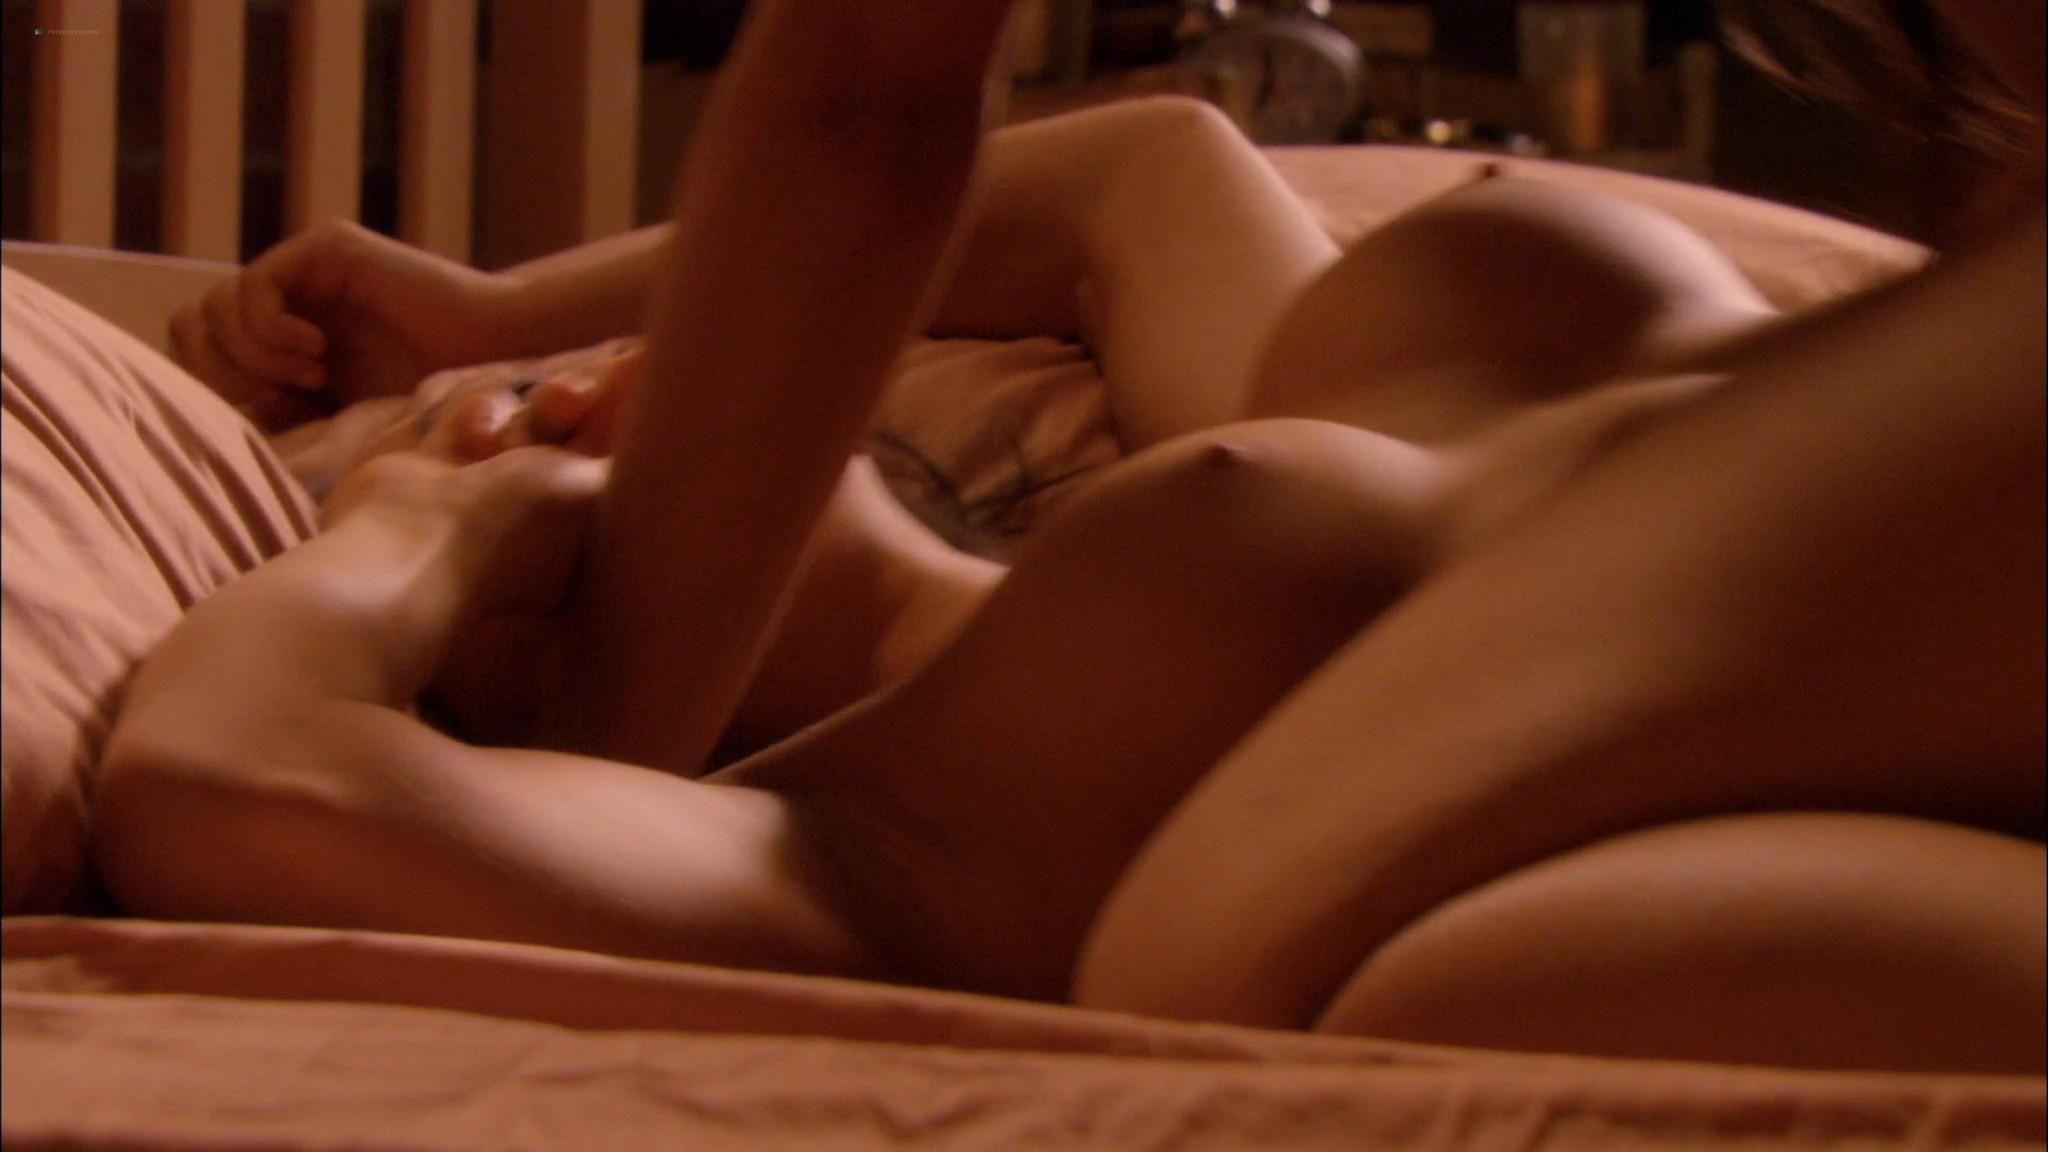 Lana Tailor nude sex Albina Nahar Denise Cobar nude sex Lingerie 2010 HD 1080p 008